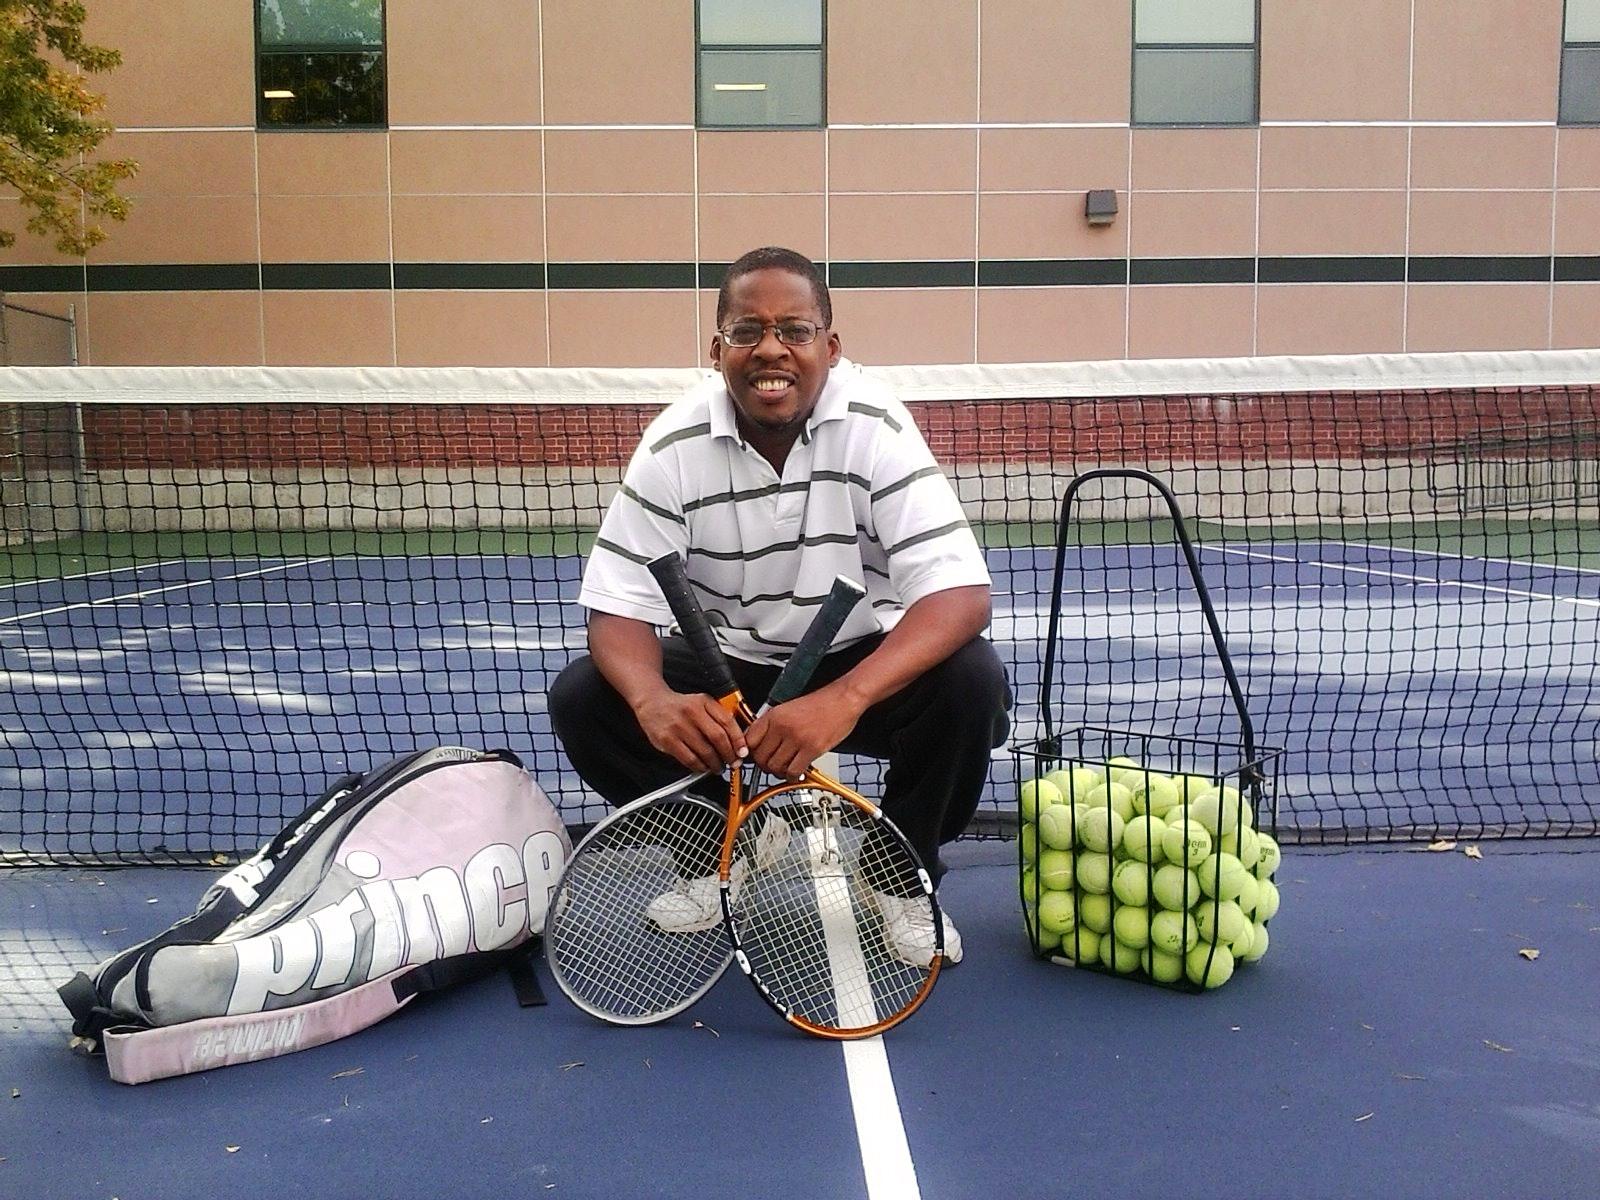 Kerry N. teaches tennis lessons in Denver, CO